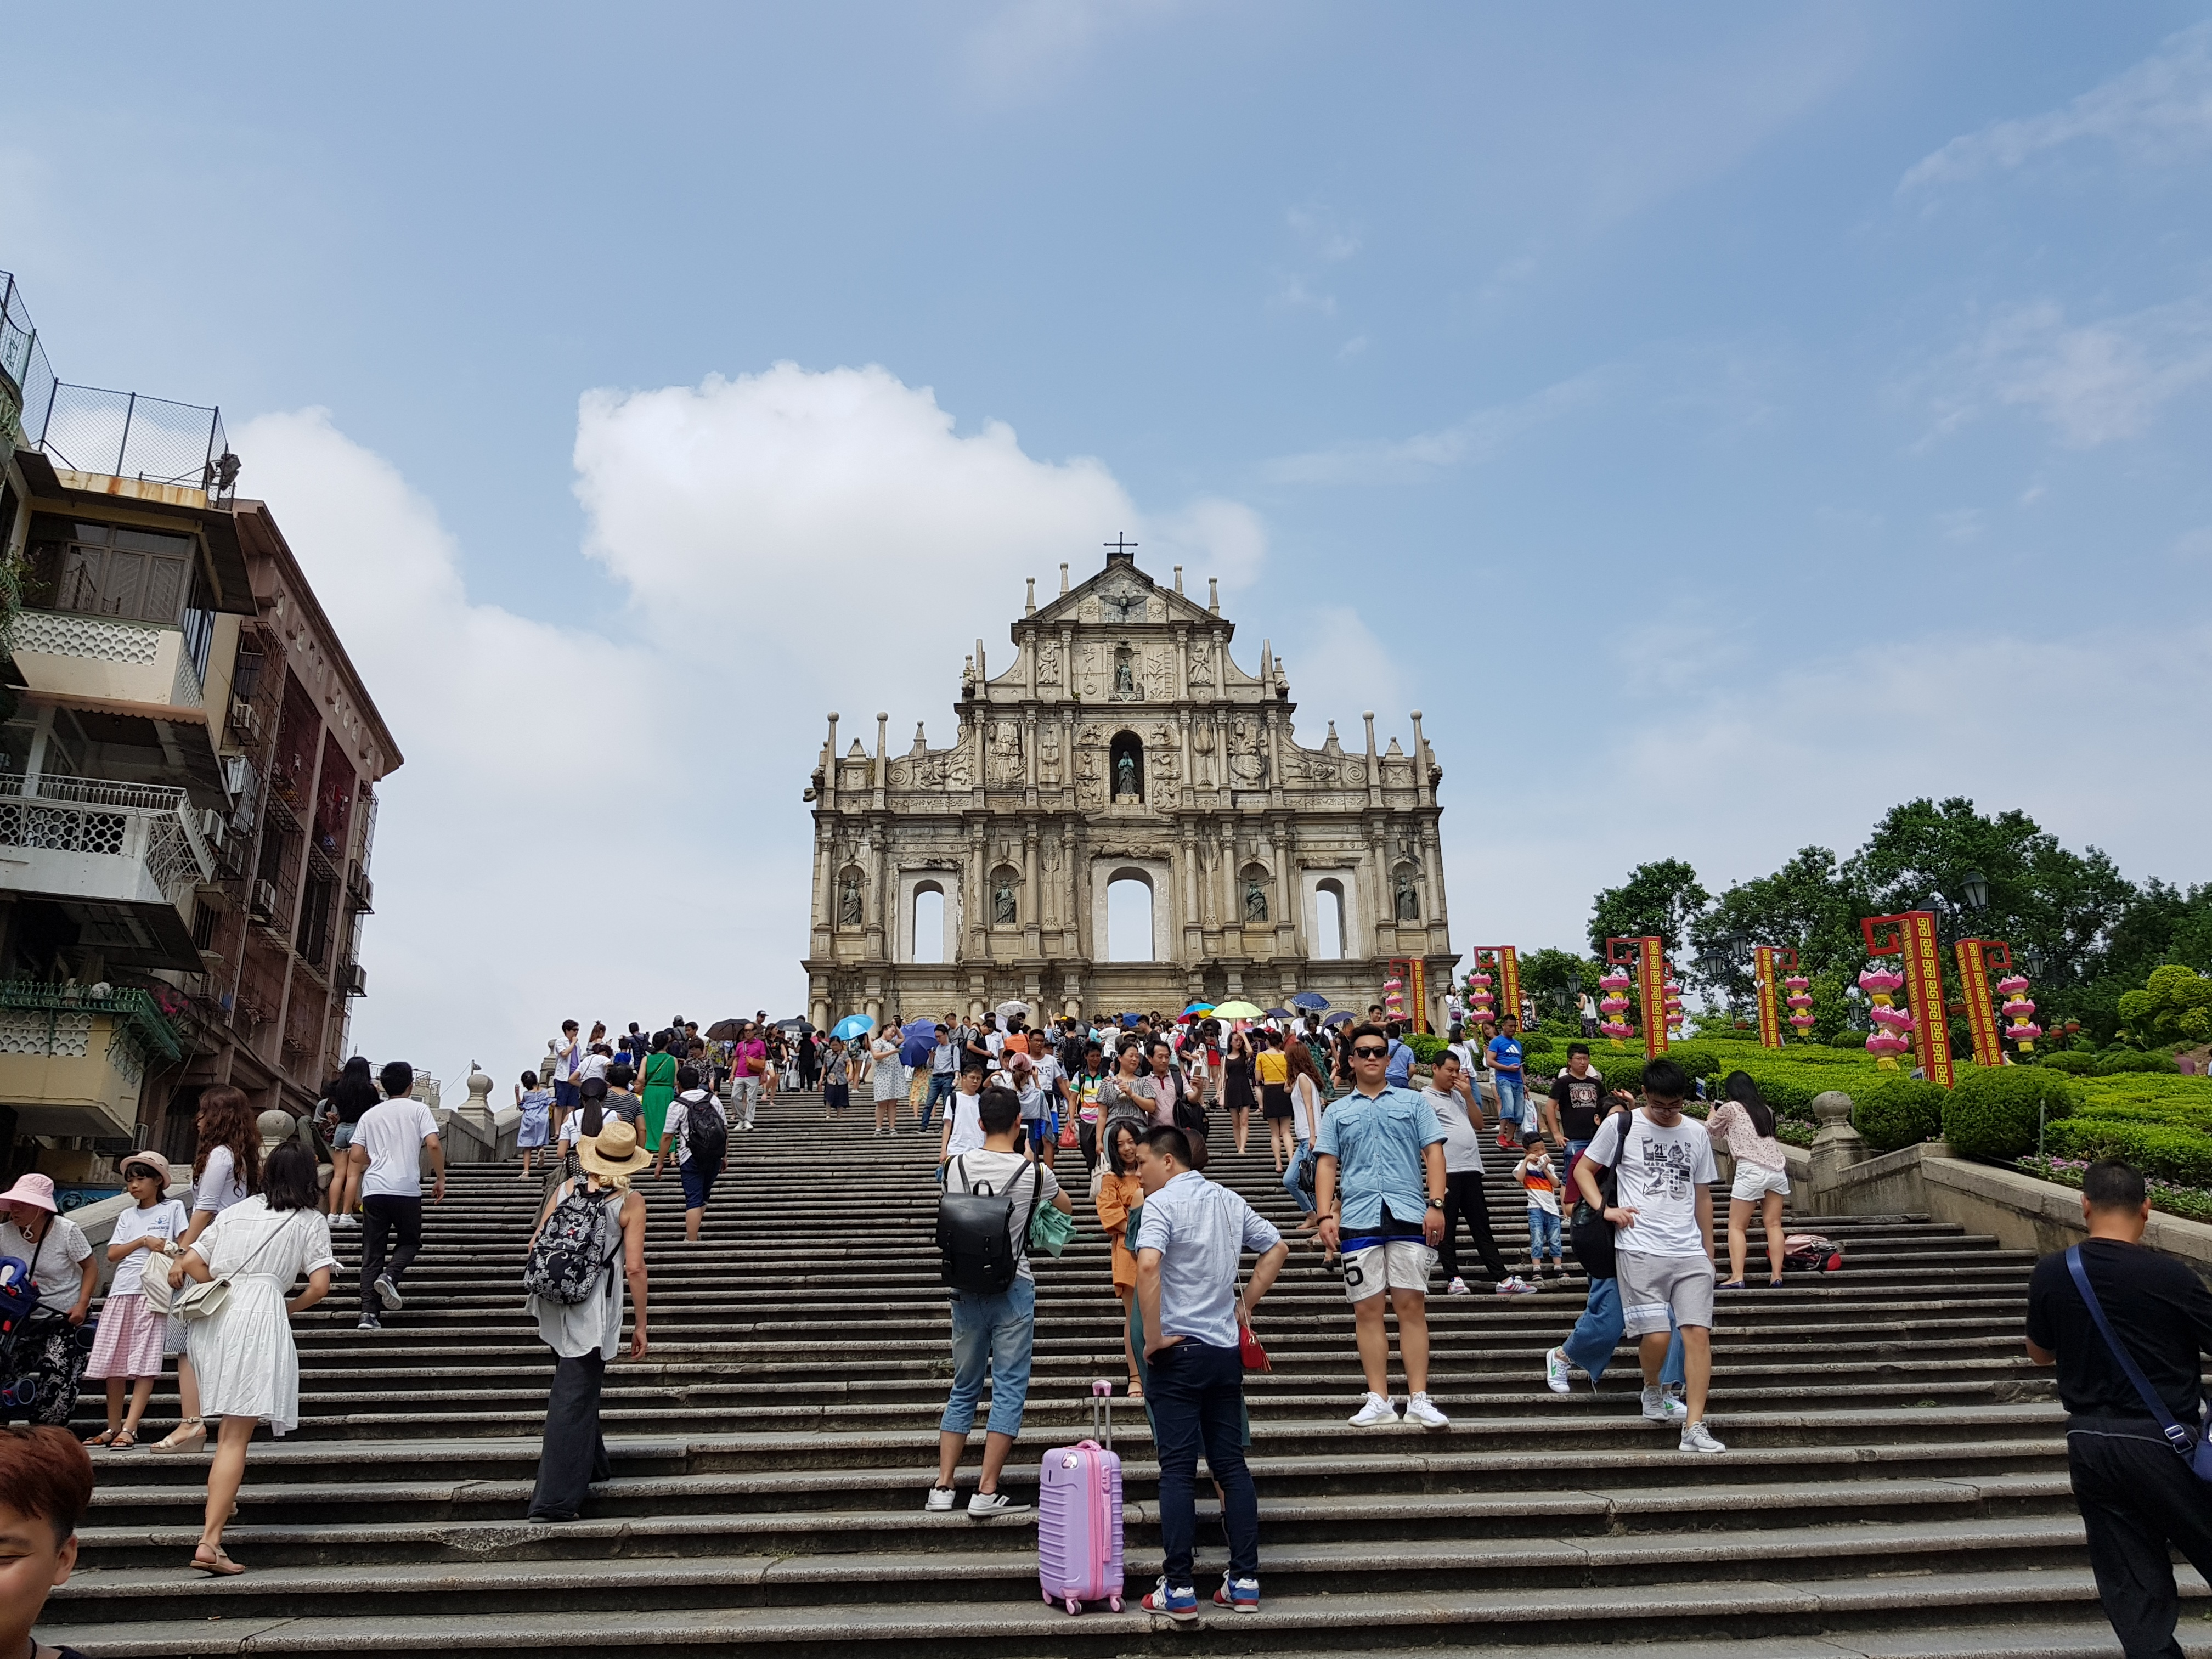 Ruins of the St Paul's church in Macau